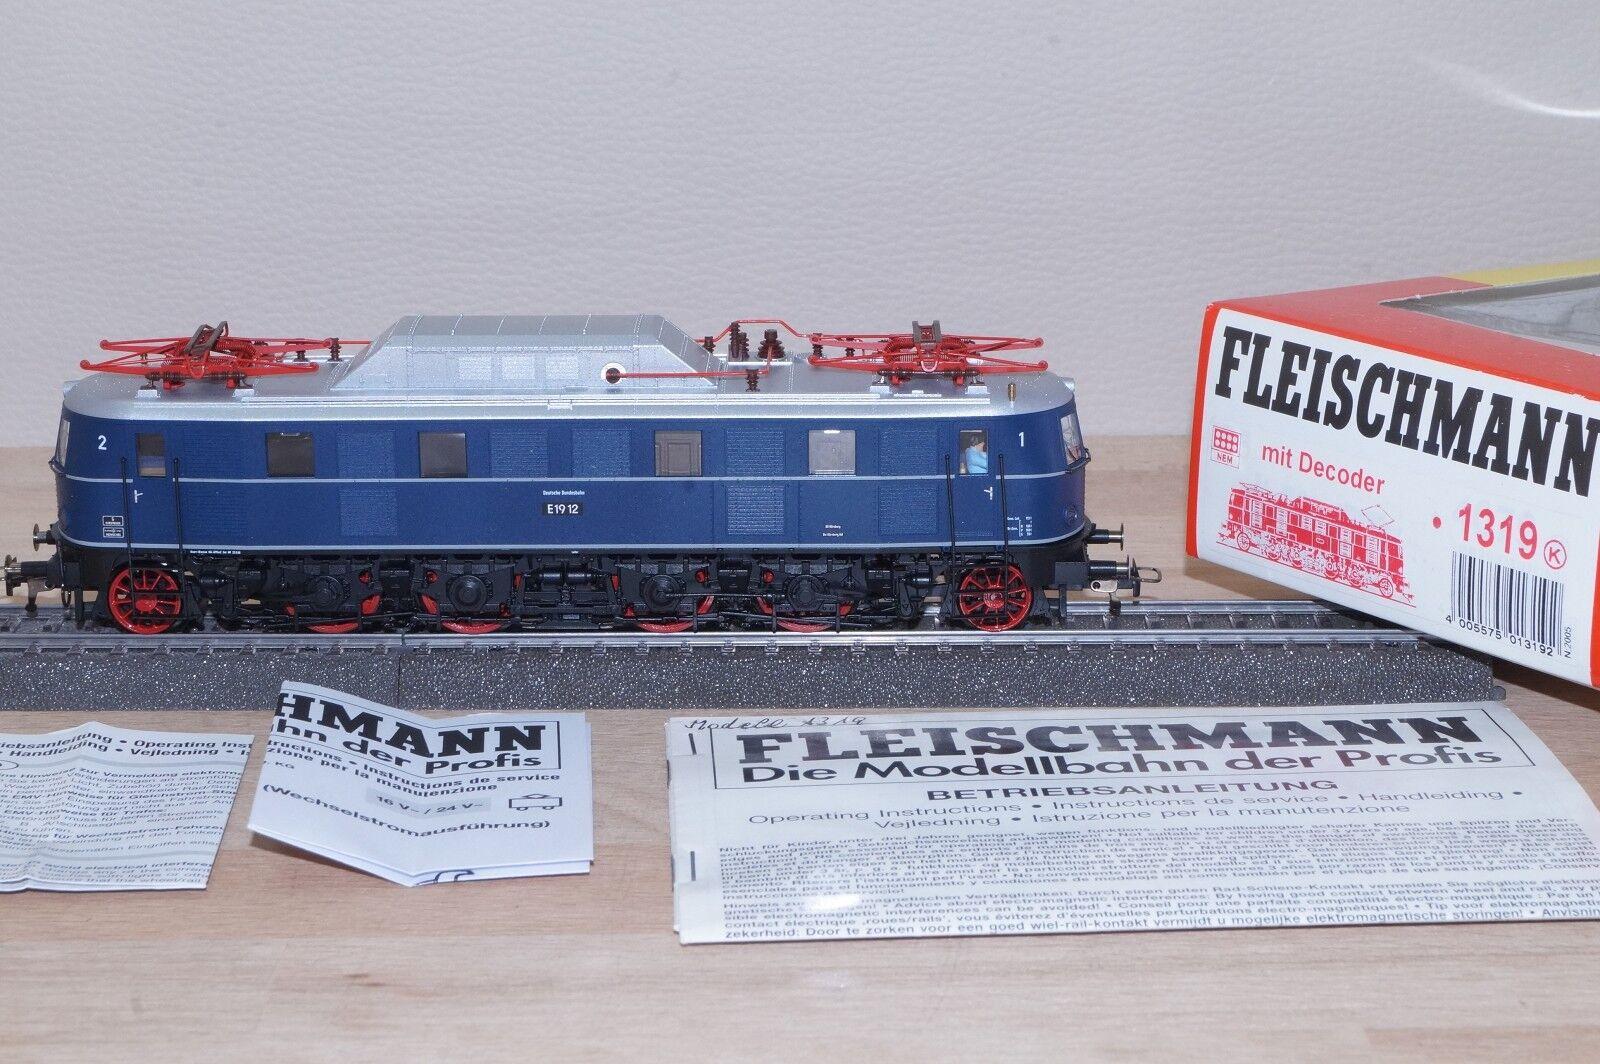 Fleischmann 1319 Locomotora Eléctrica Br E 19 12 de DB Altbau-Lok Digital AC